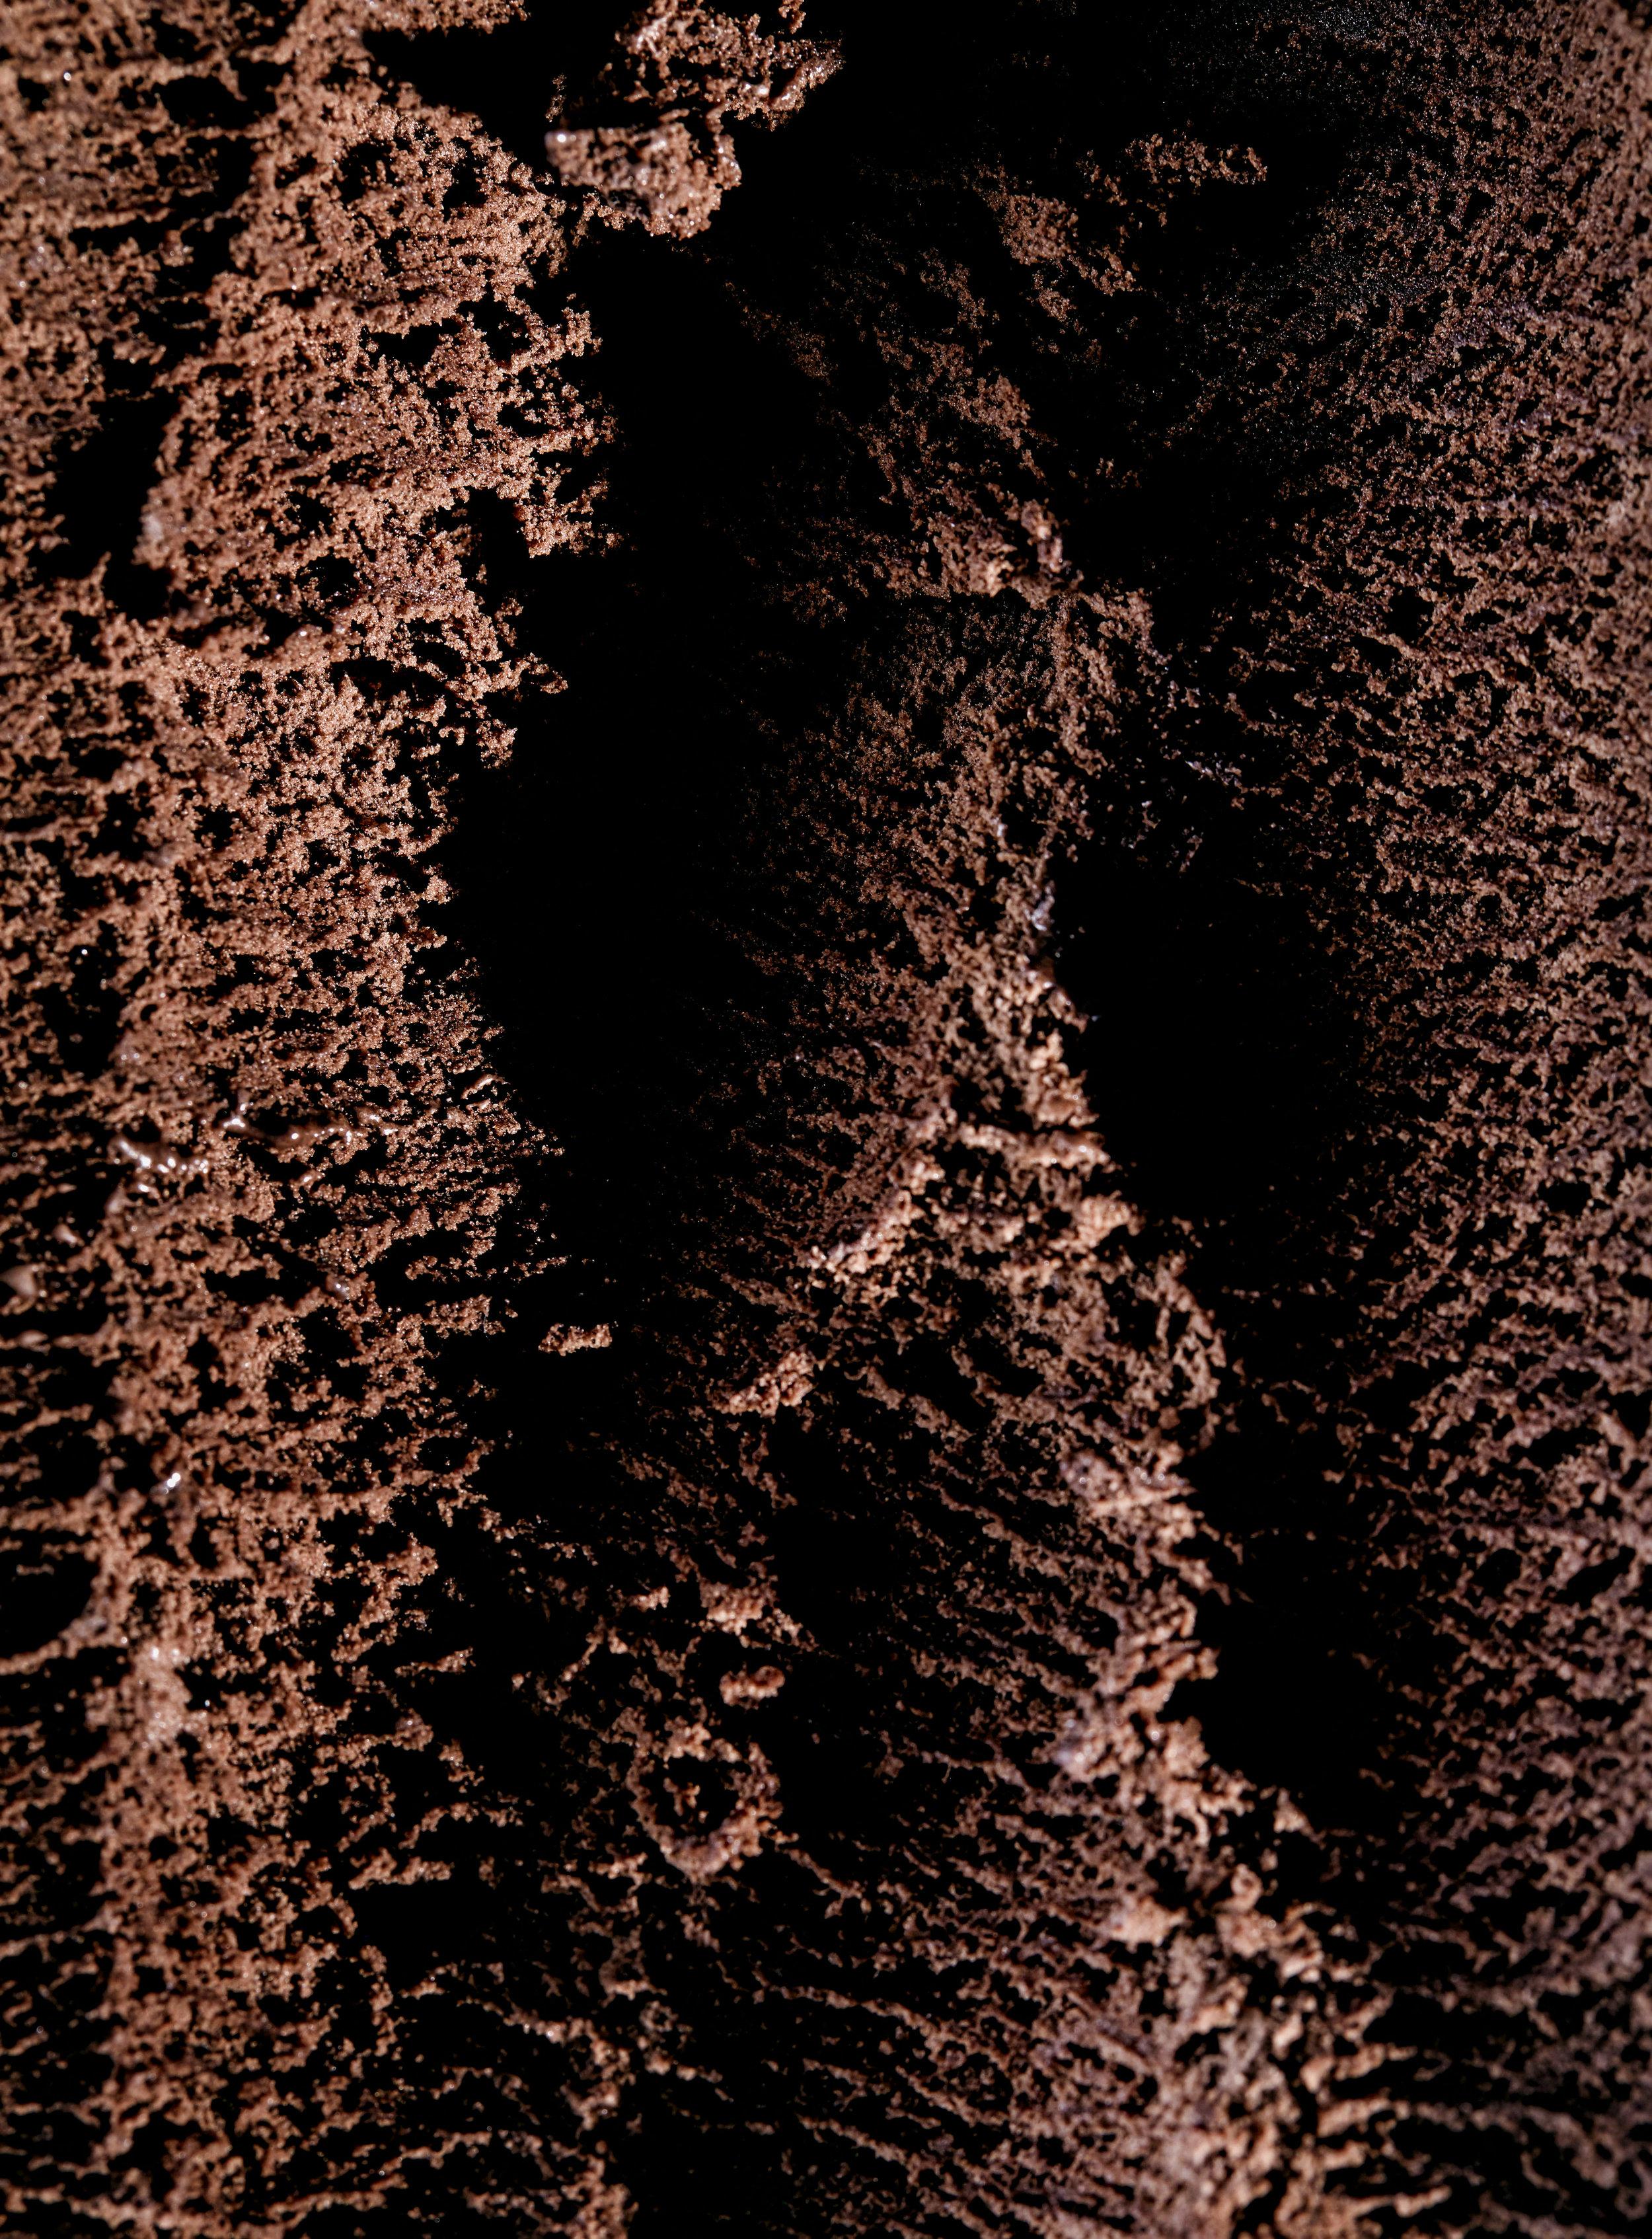 Textured Chocolate Ice Cream Toronto Food photographer